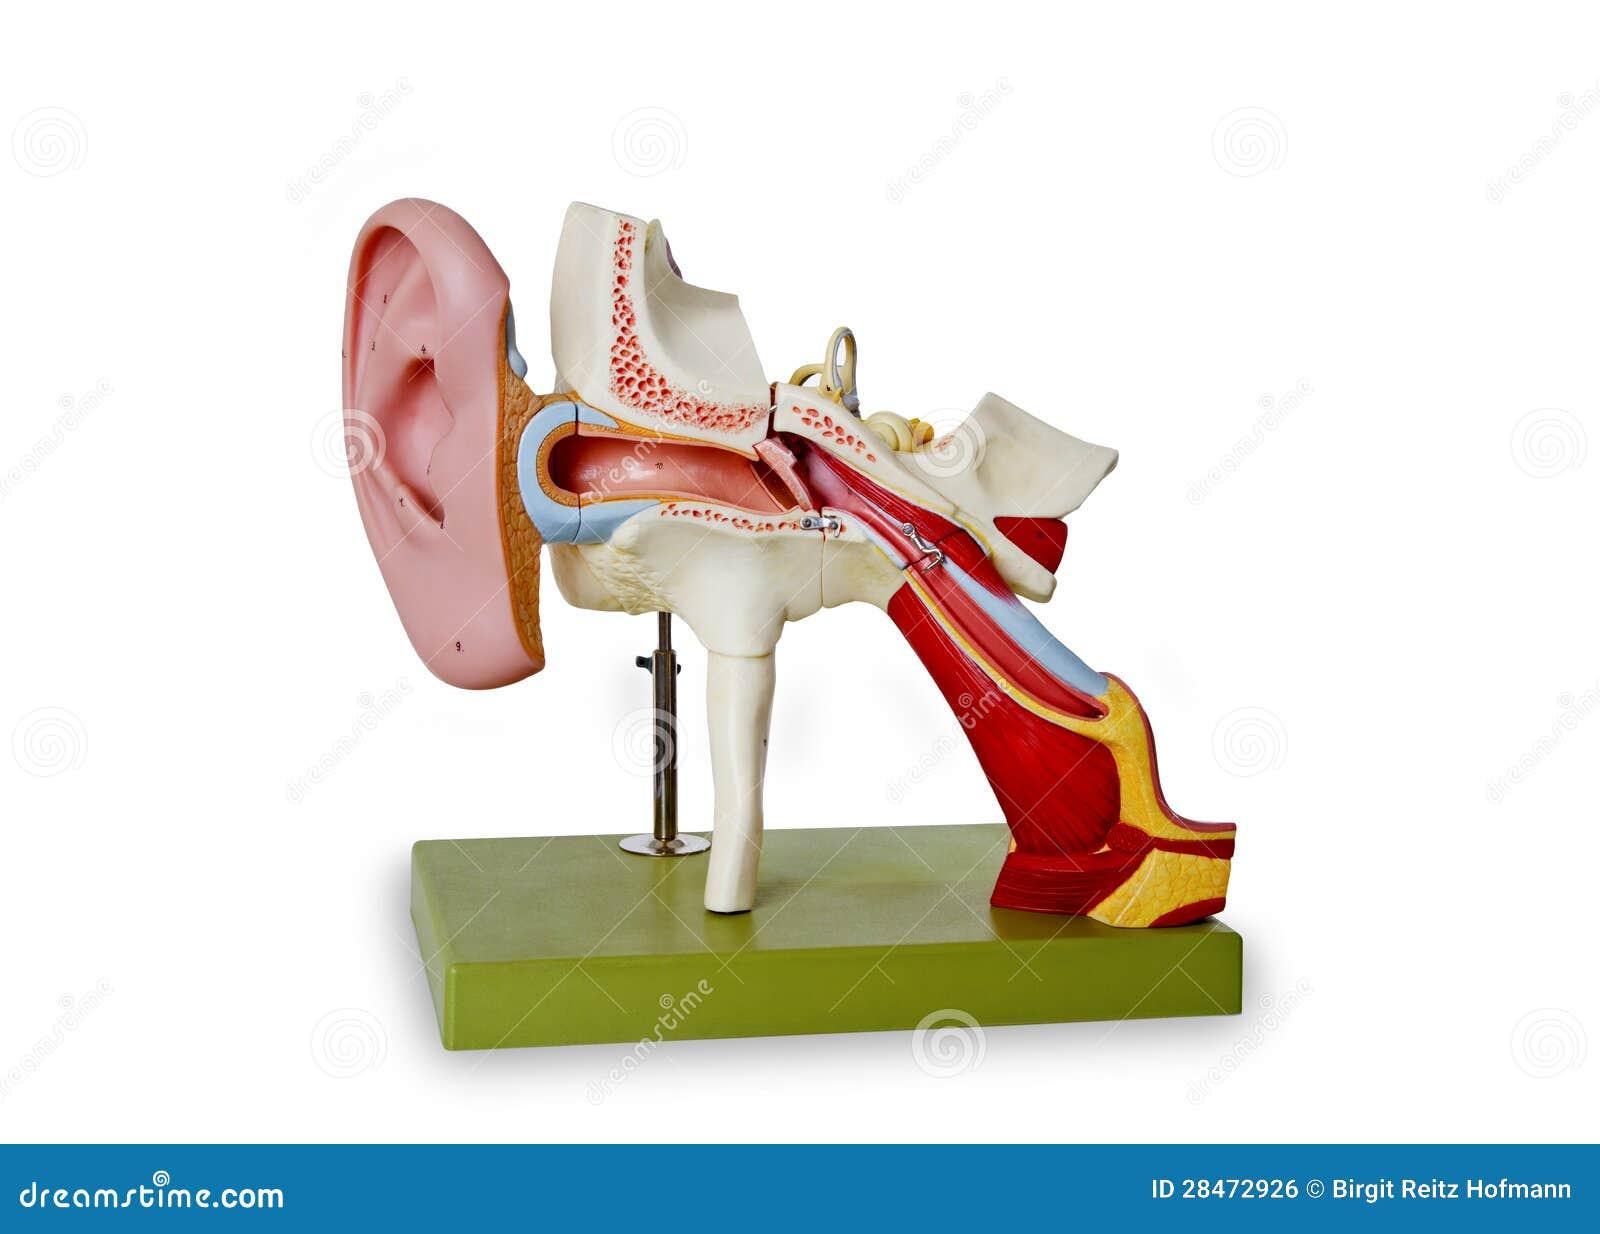 Modelo del canal auditivo